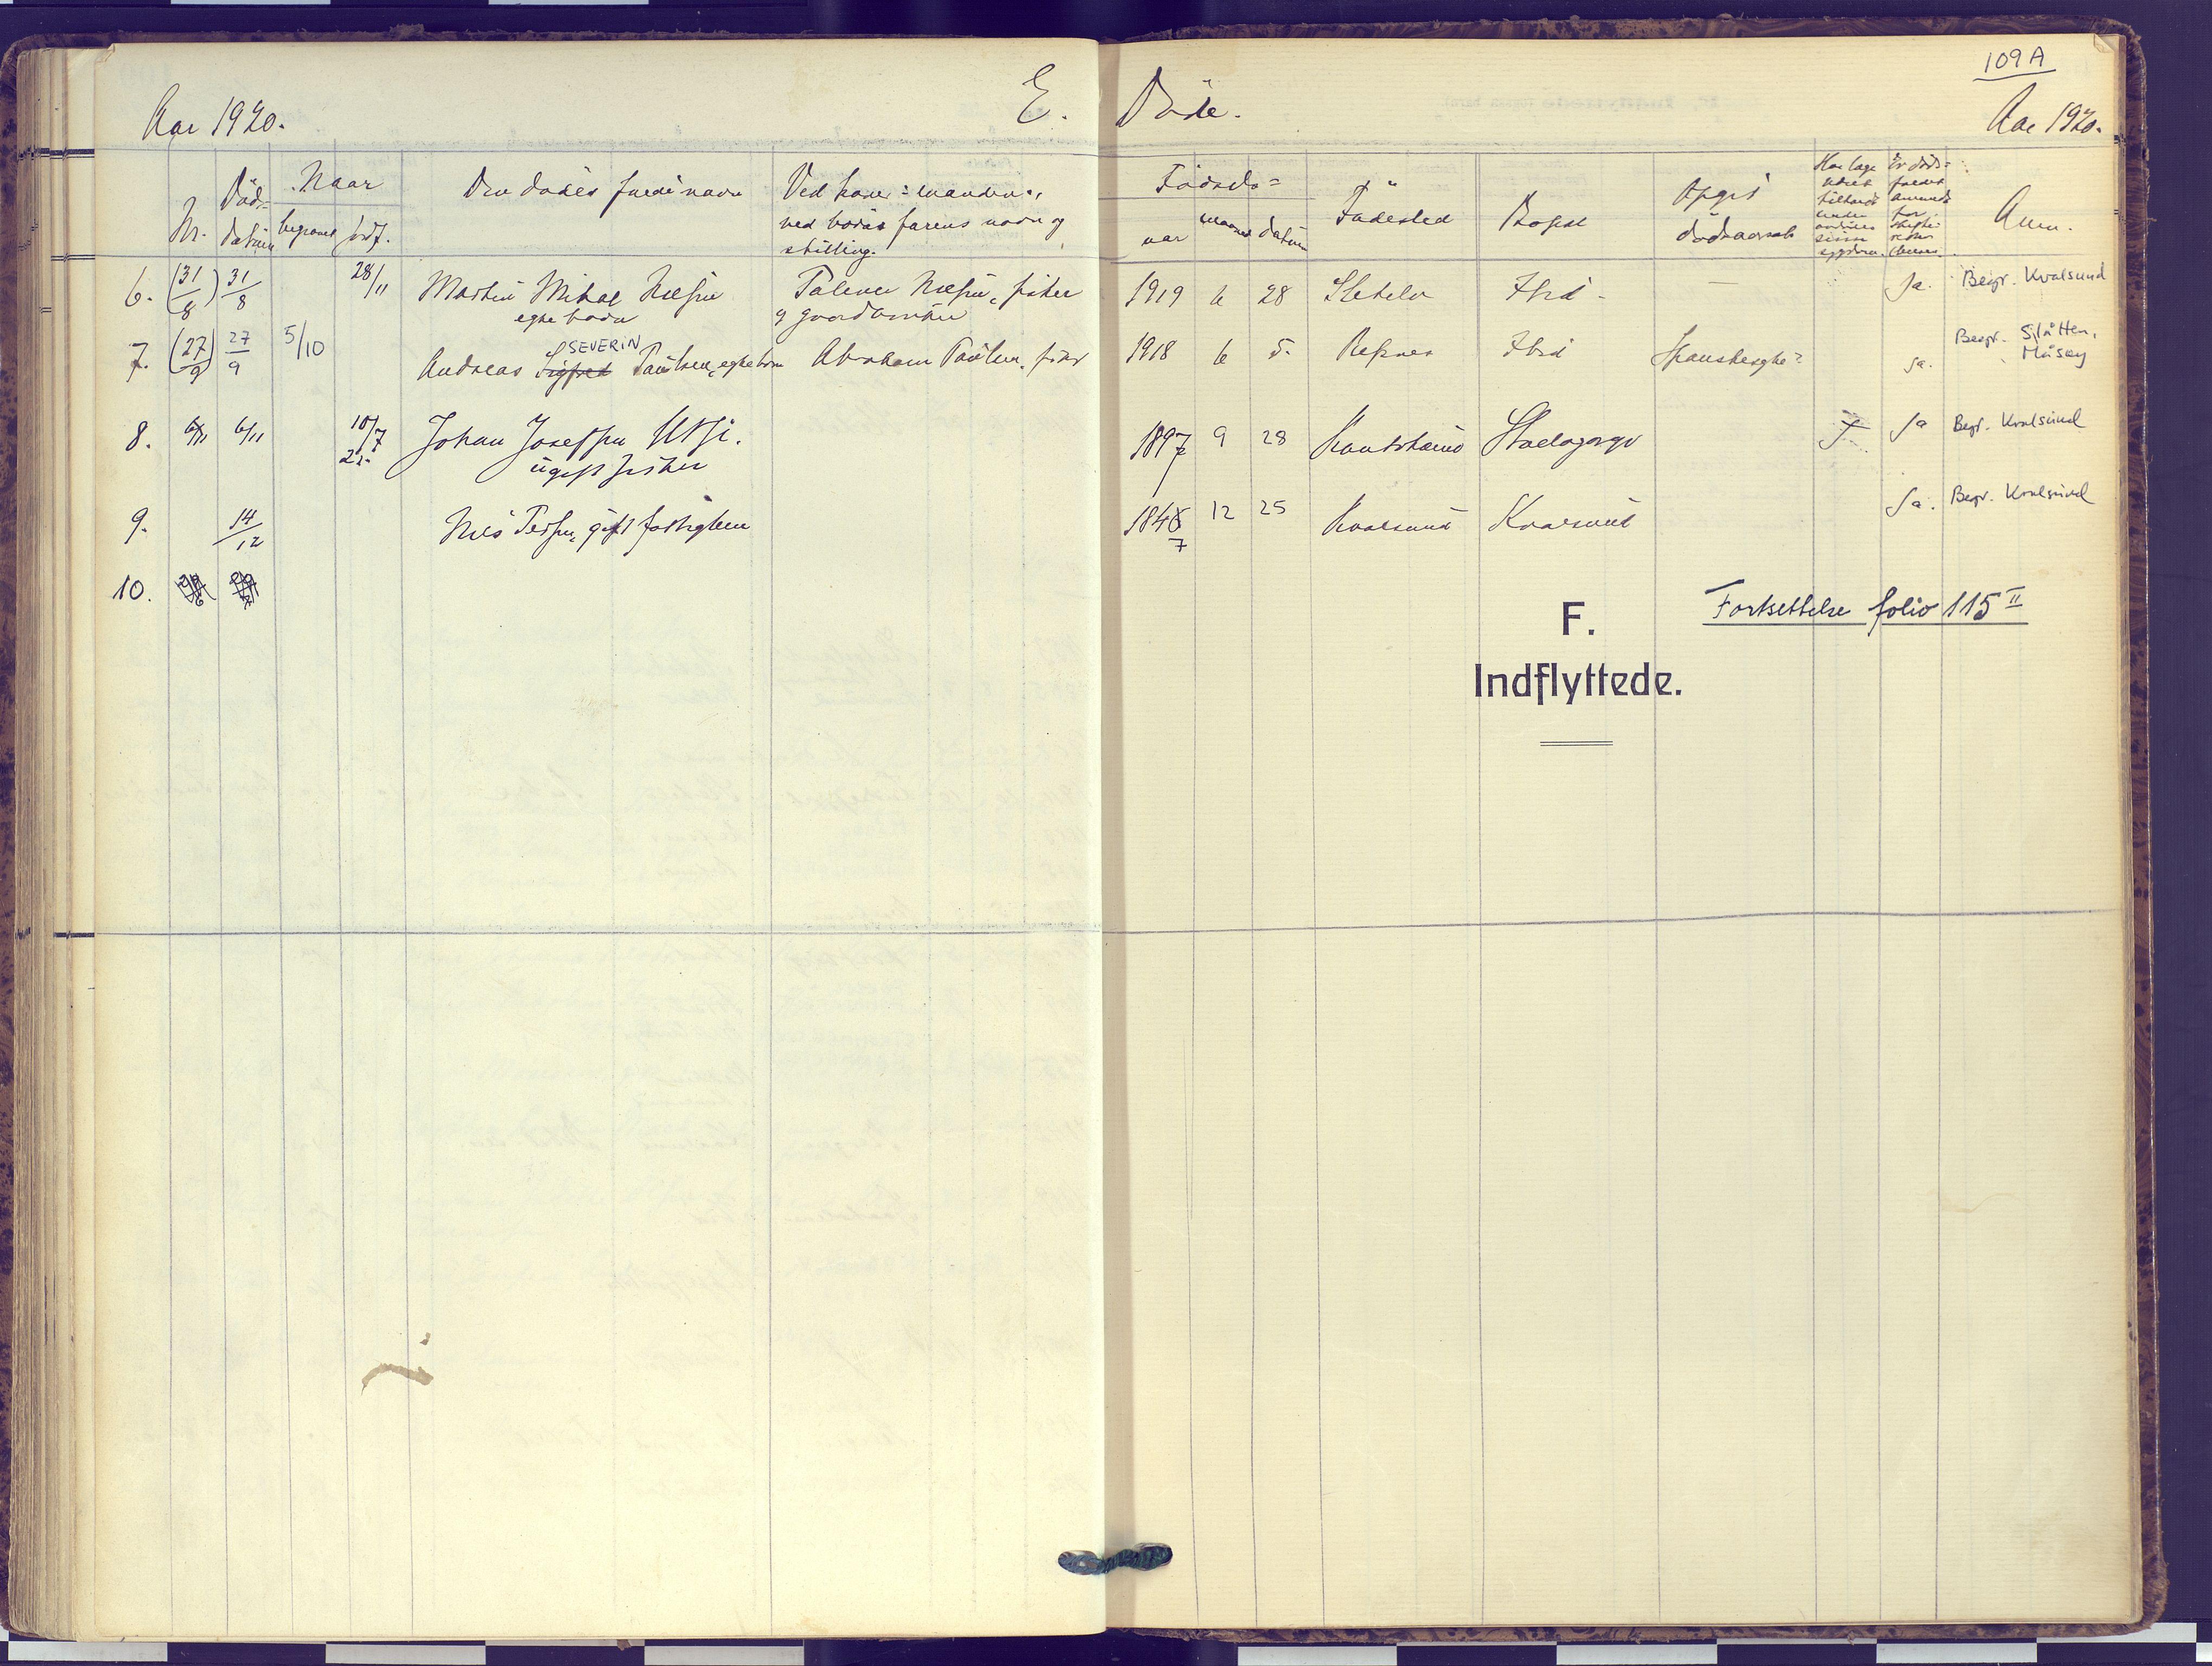 SATØ, Hammerfest sokneprestembete, Ministerialbok nr. 16, 1908-1923, s. 109